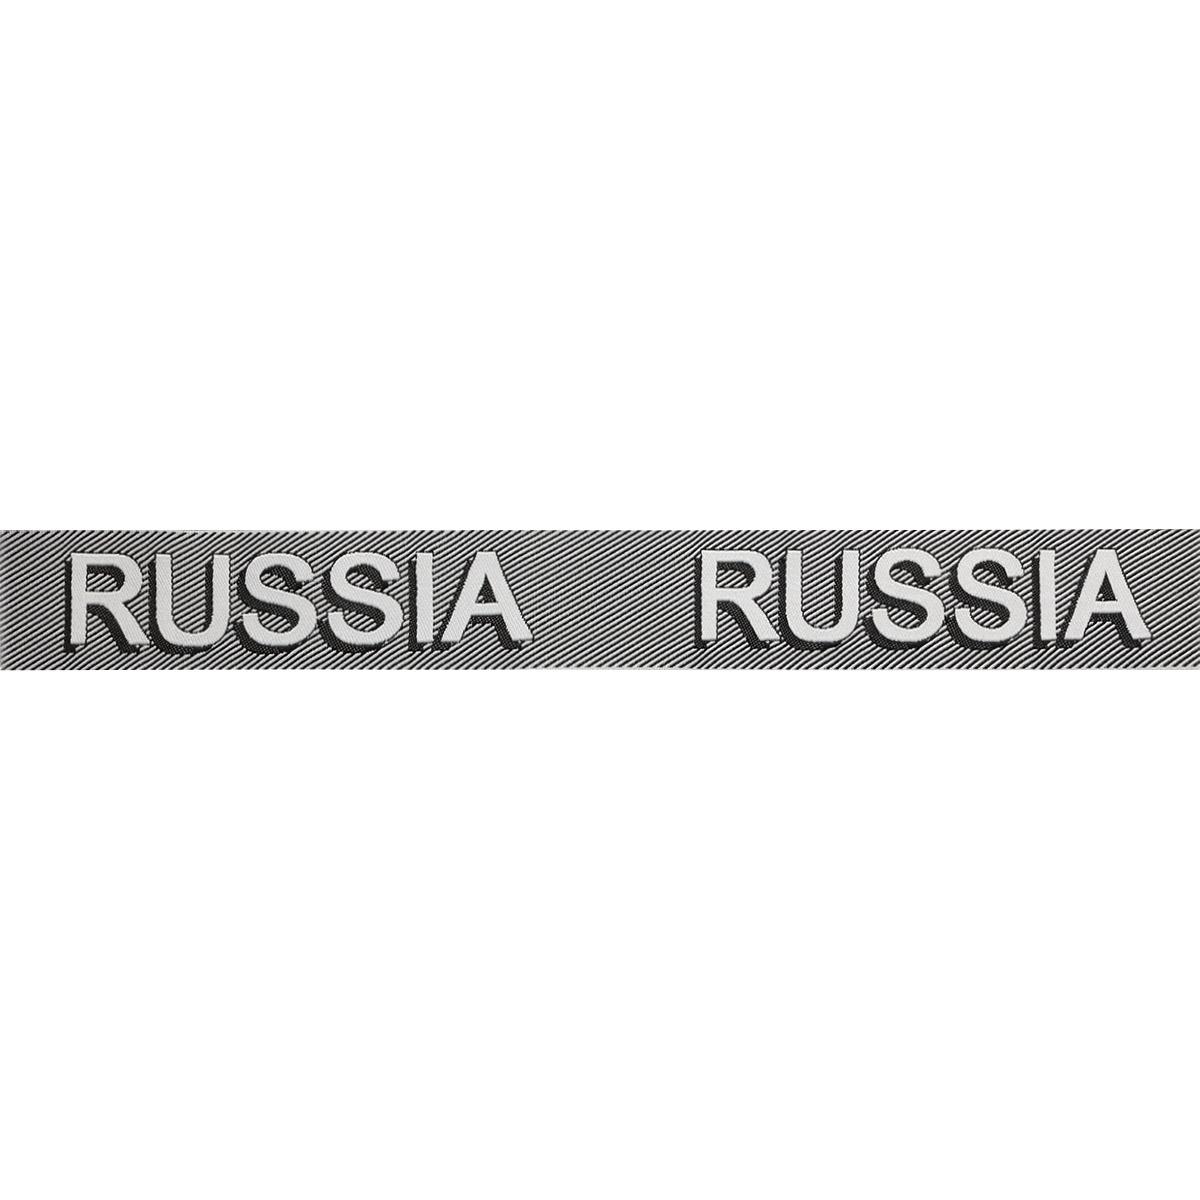 Лента отделочная с надписью 'Russia' 30мм*10м